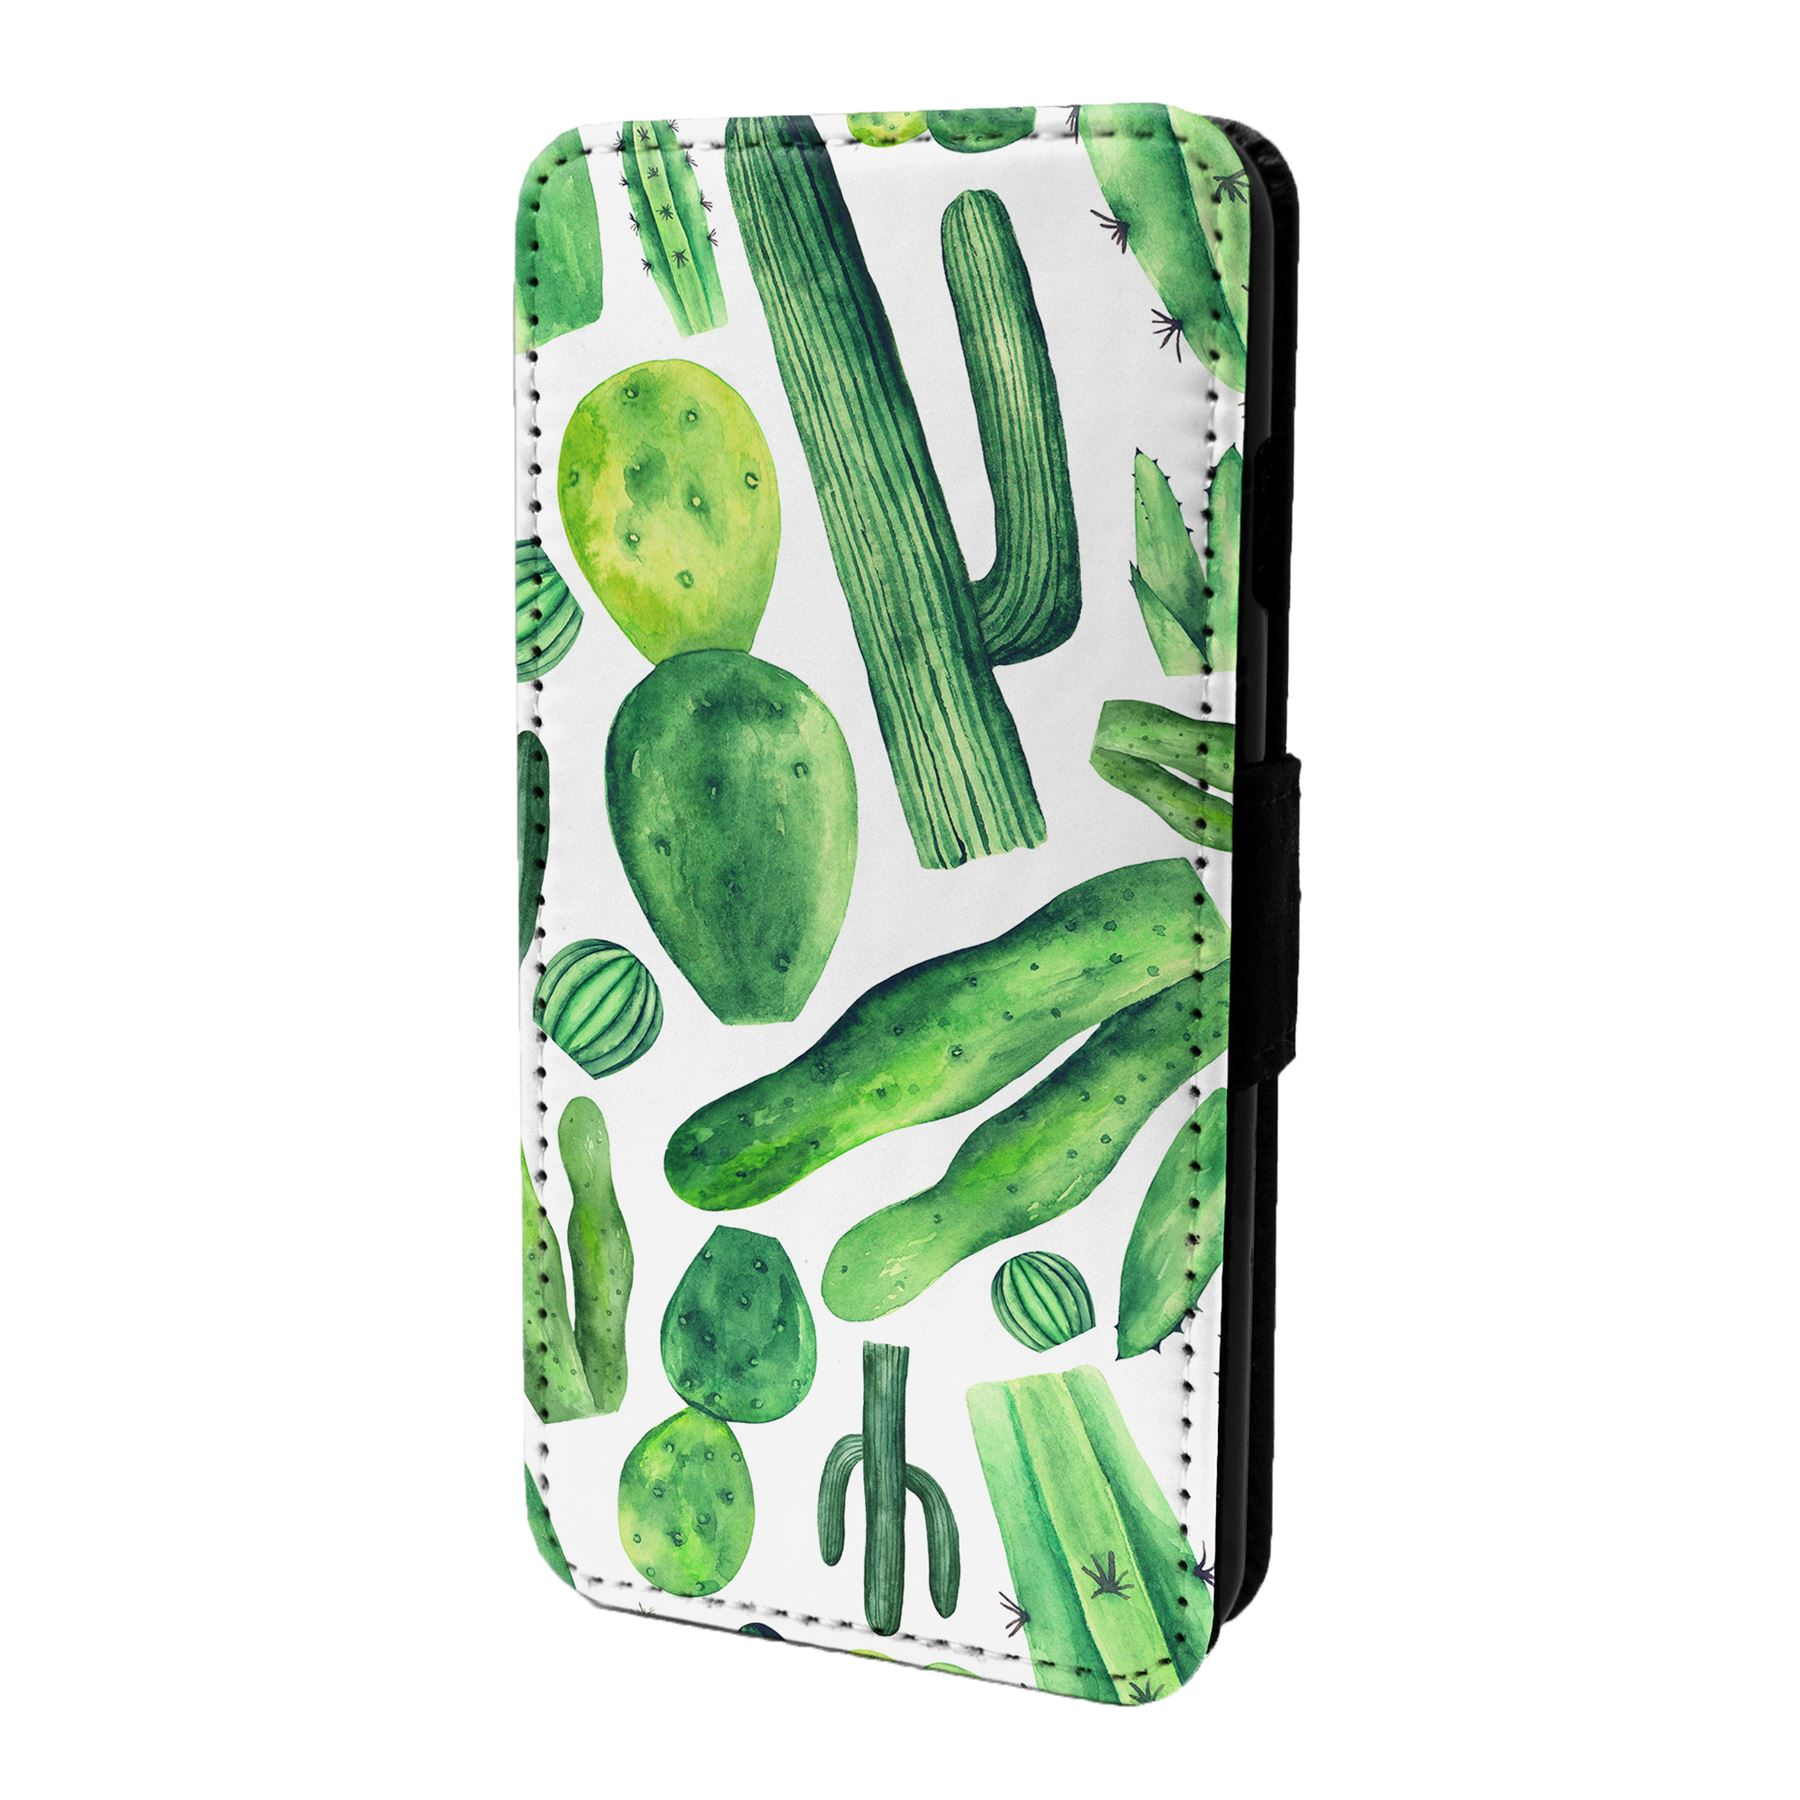 Cactus-Motif-Etui-Rabattable-pour-Telephone-Portable-S6622